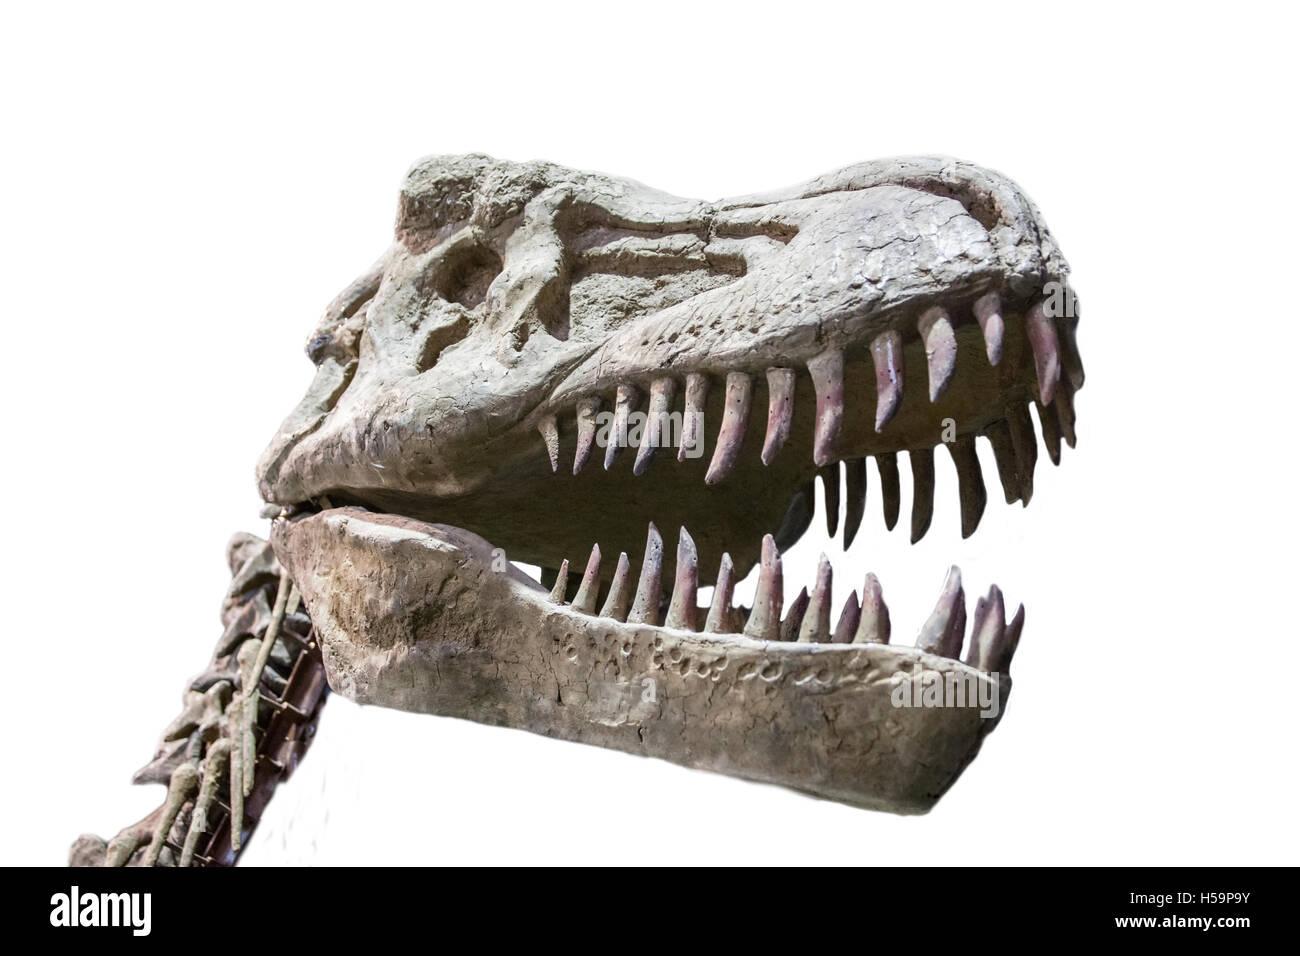 Tyrannosaurus Rex skull isolated over white background - Stock Image